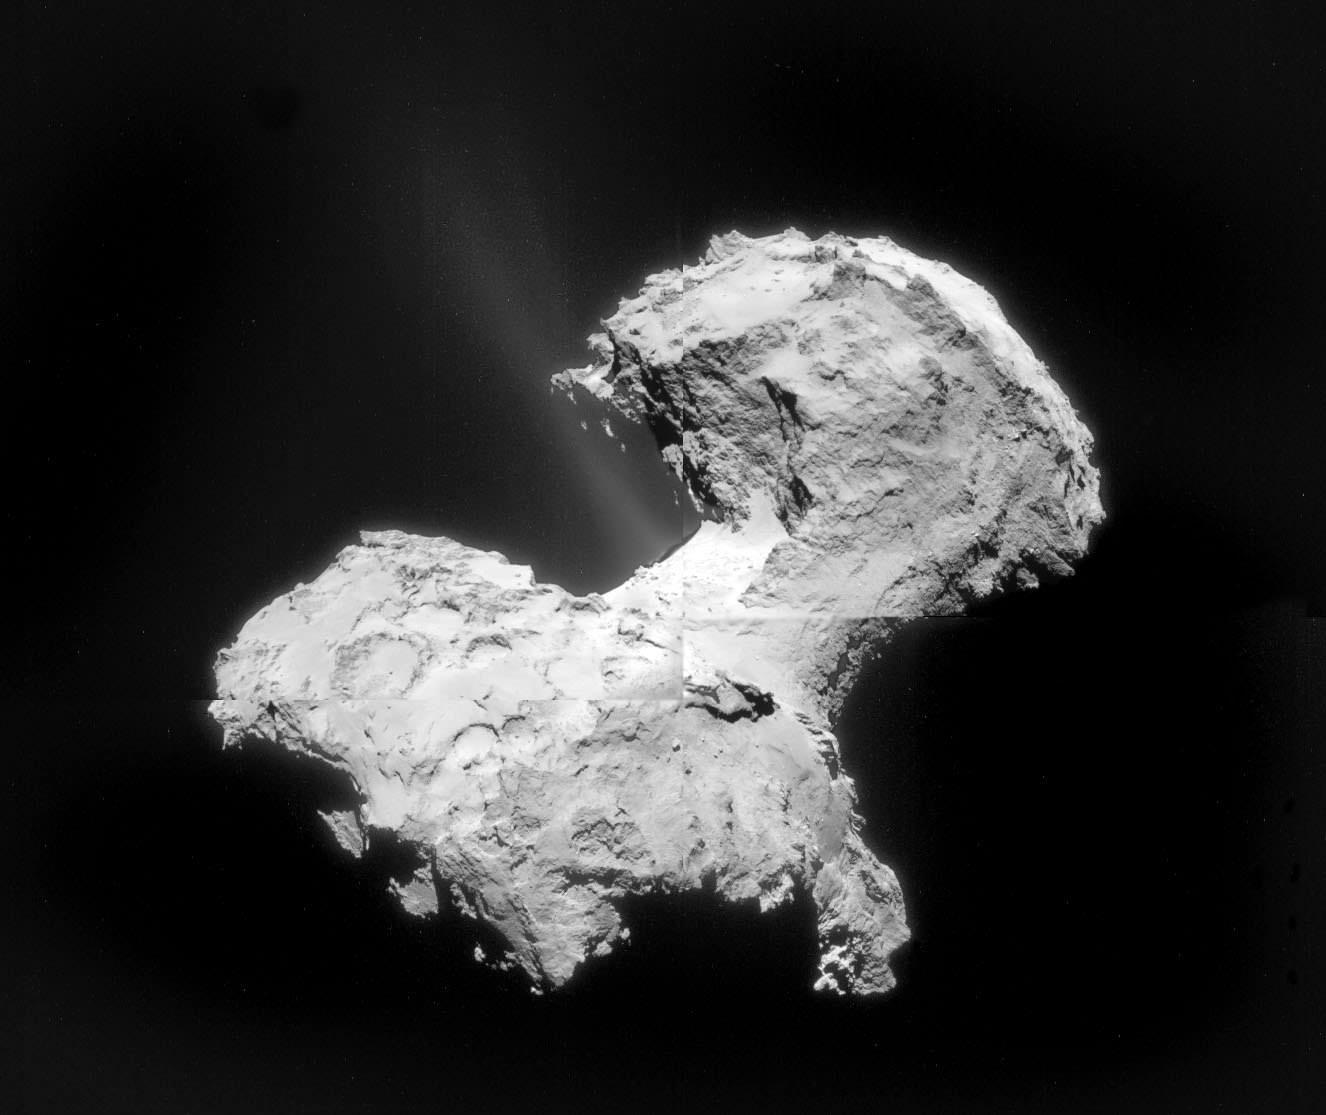 New Mosaic Reveals Jets Blasting from Rosetta's Comet Rosetta